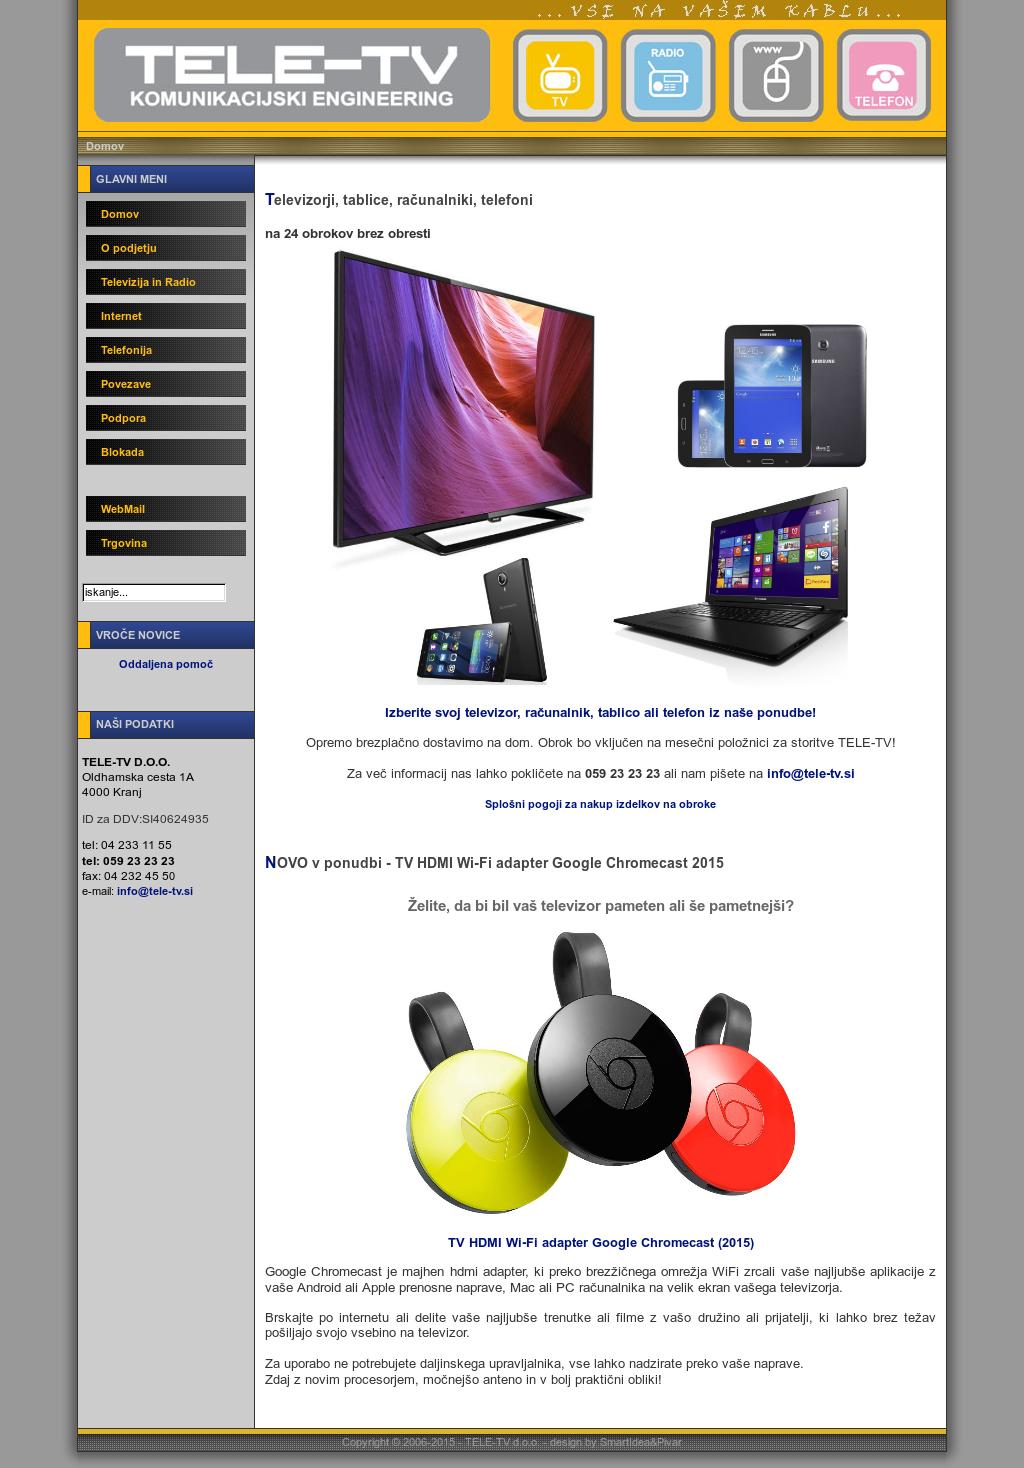 Tele-tv D o o Competitors, Revenue and Employees - Owler Company Profile